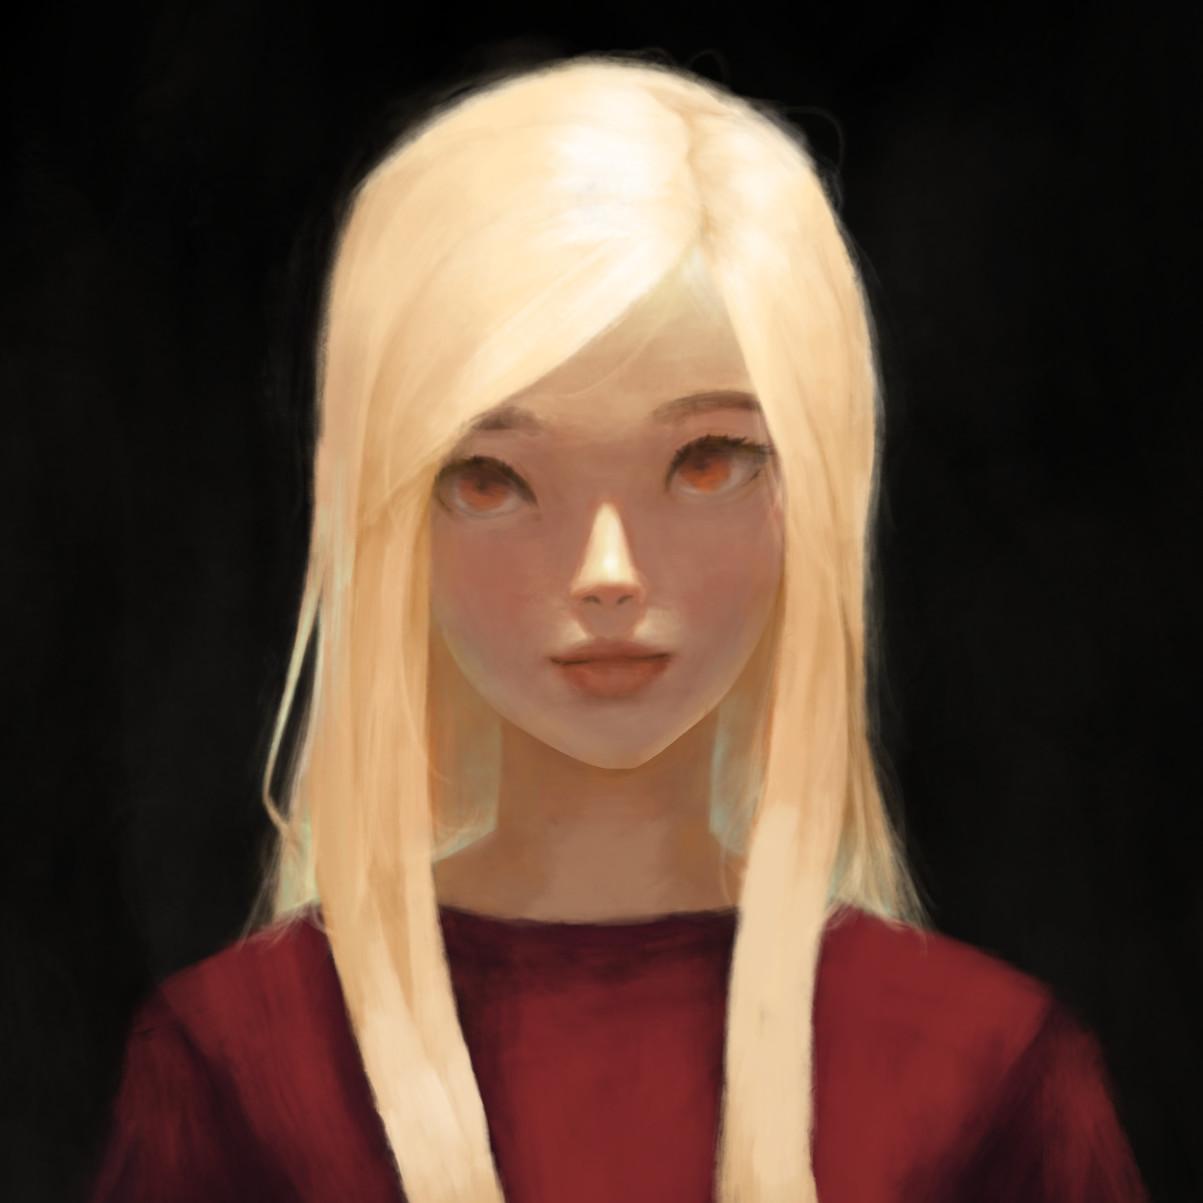 TONYA: Blond Experiment